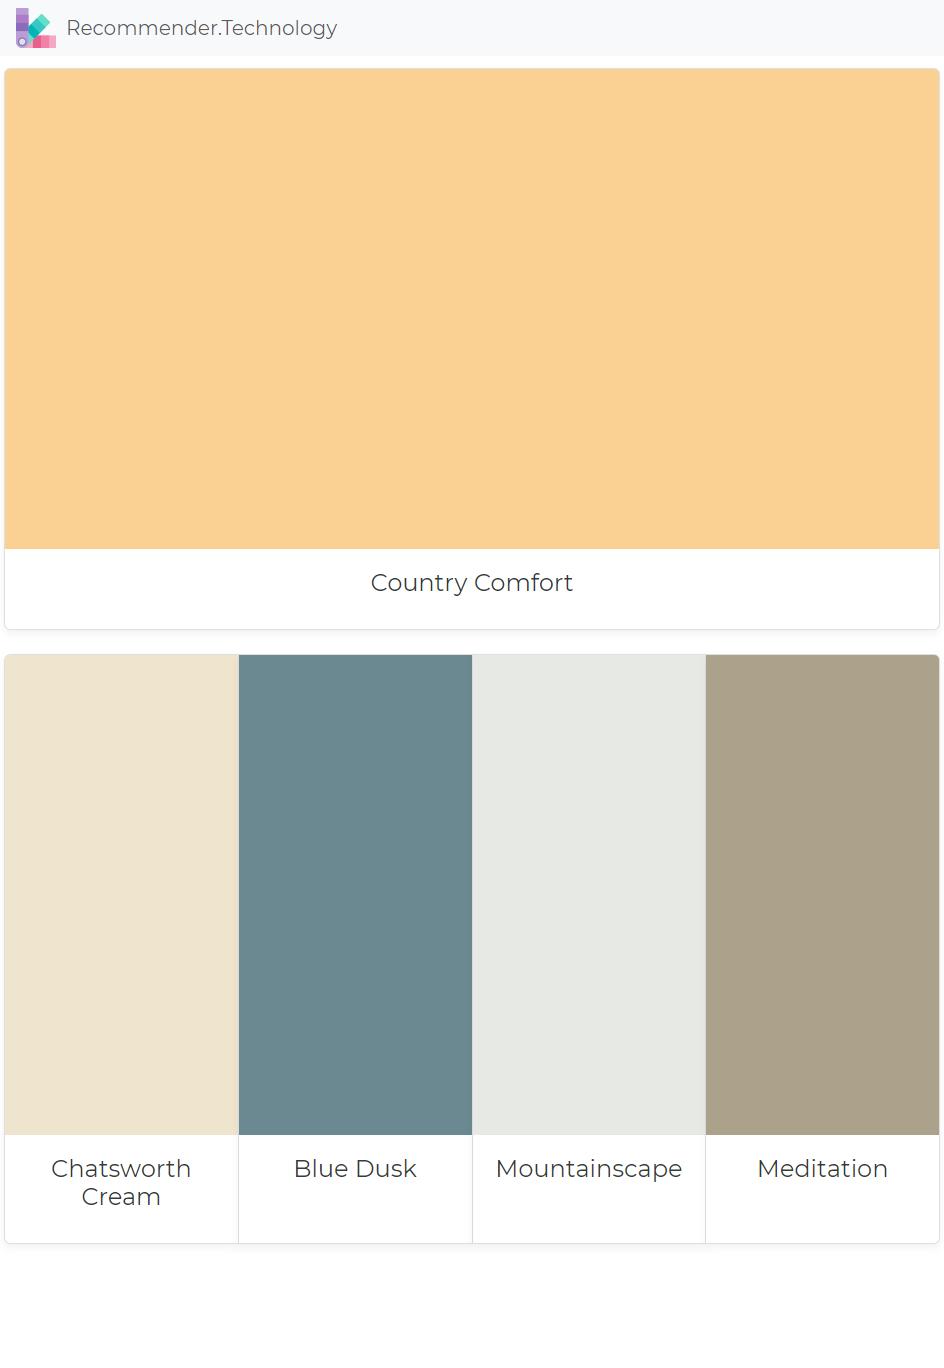 Country Comfort Chatsworth Cream Blue Dusk Mountainscape Meditation Paint Color Palettes